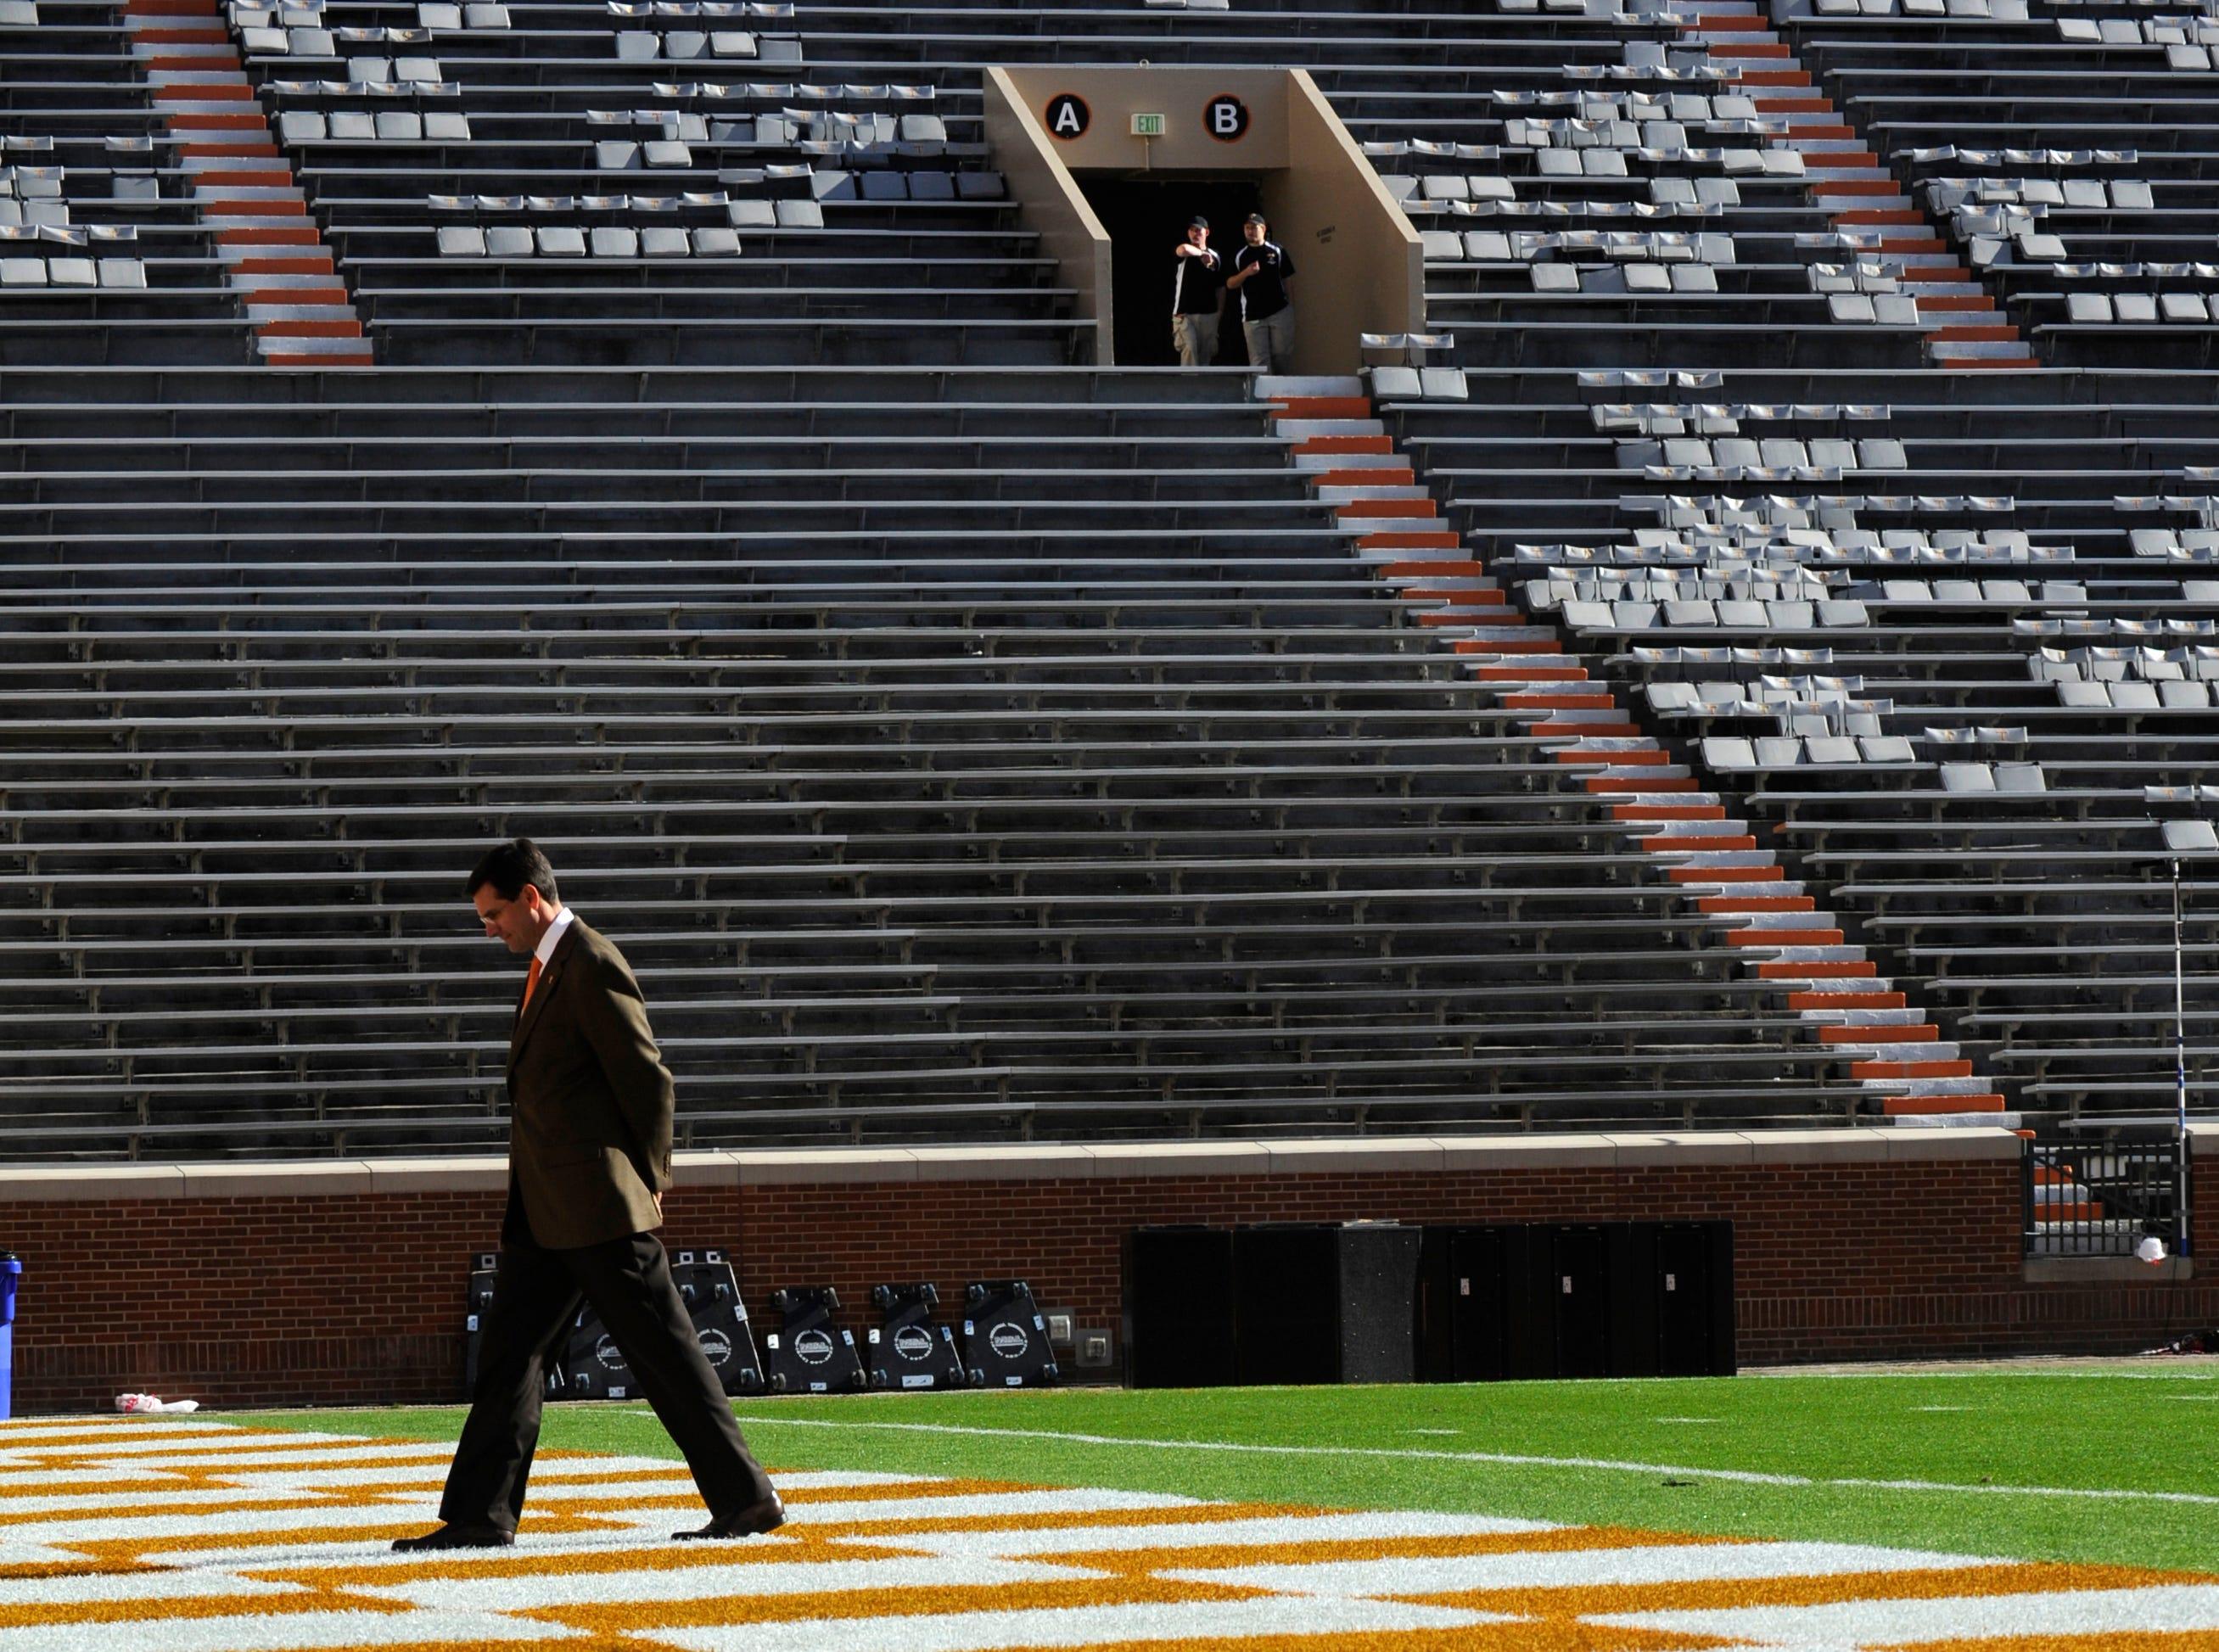 Tennessee head football coach Derek Dooley surveys the field before the game against Missouri at Neyland Stadium, Saturday, Nov. 10, 2012.